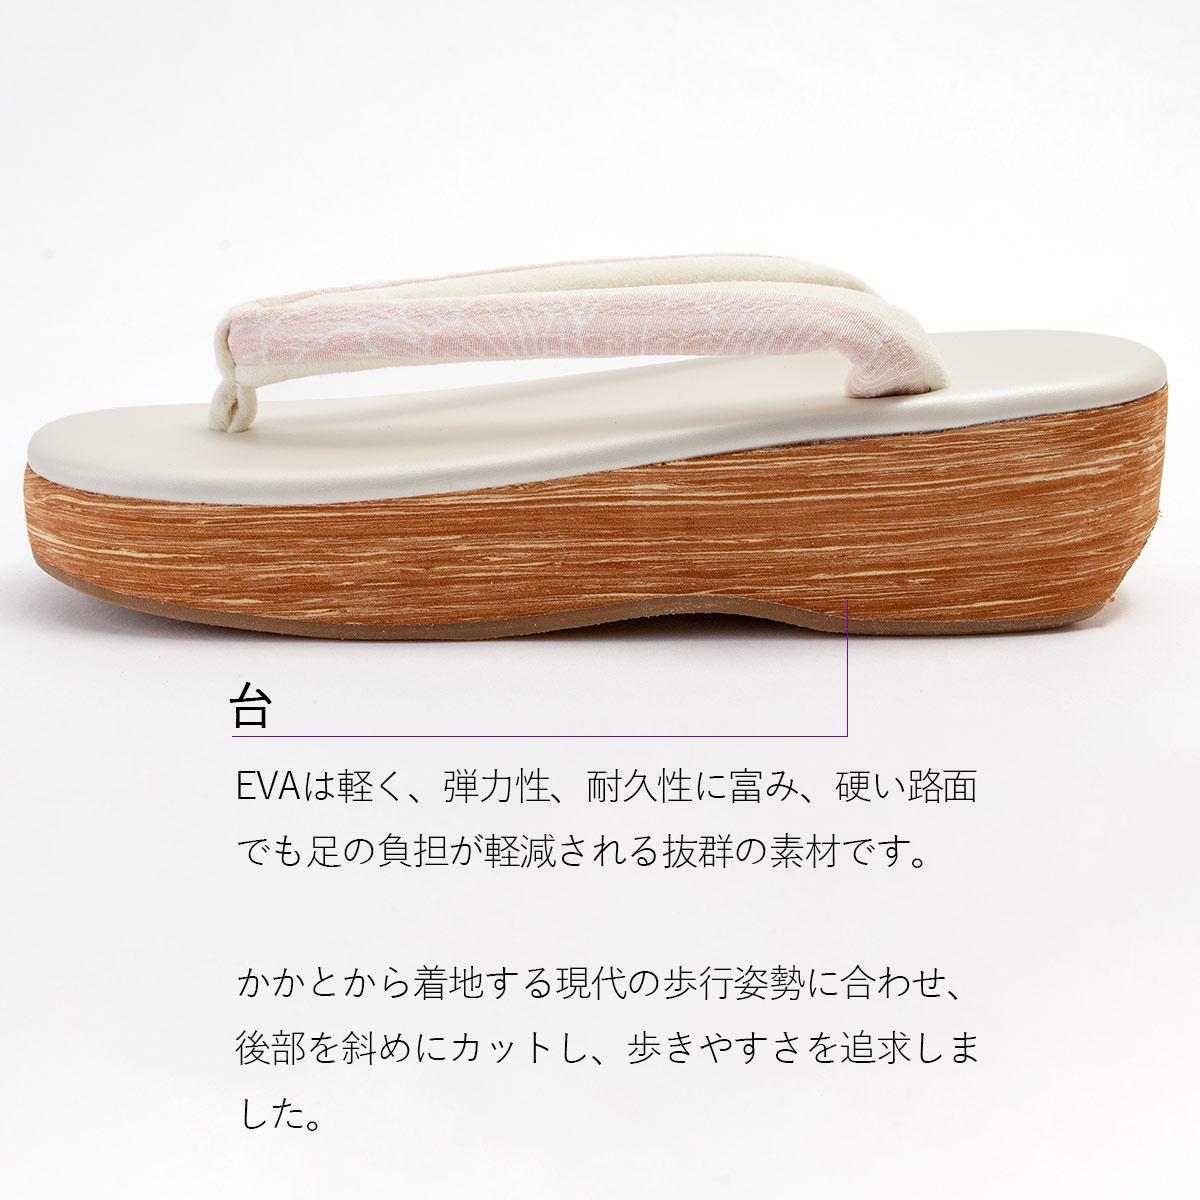 . HAKU 草履 NO.115 |ホワイト×ピンク /> <br><br> <img src=